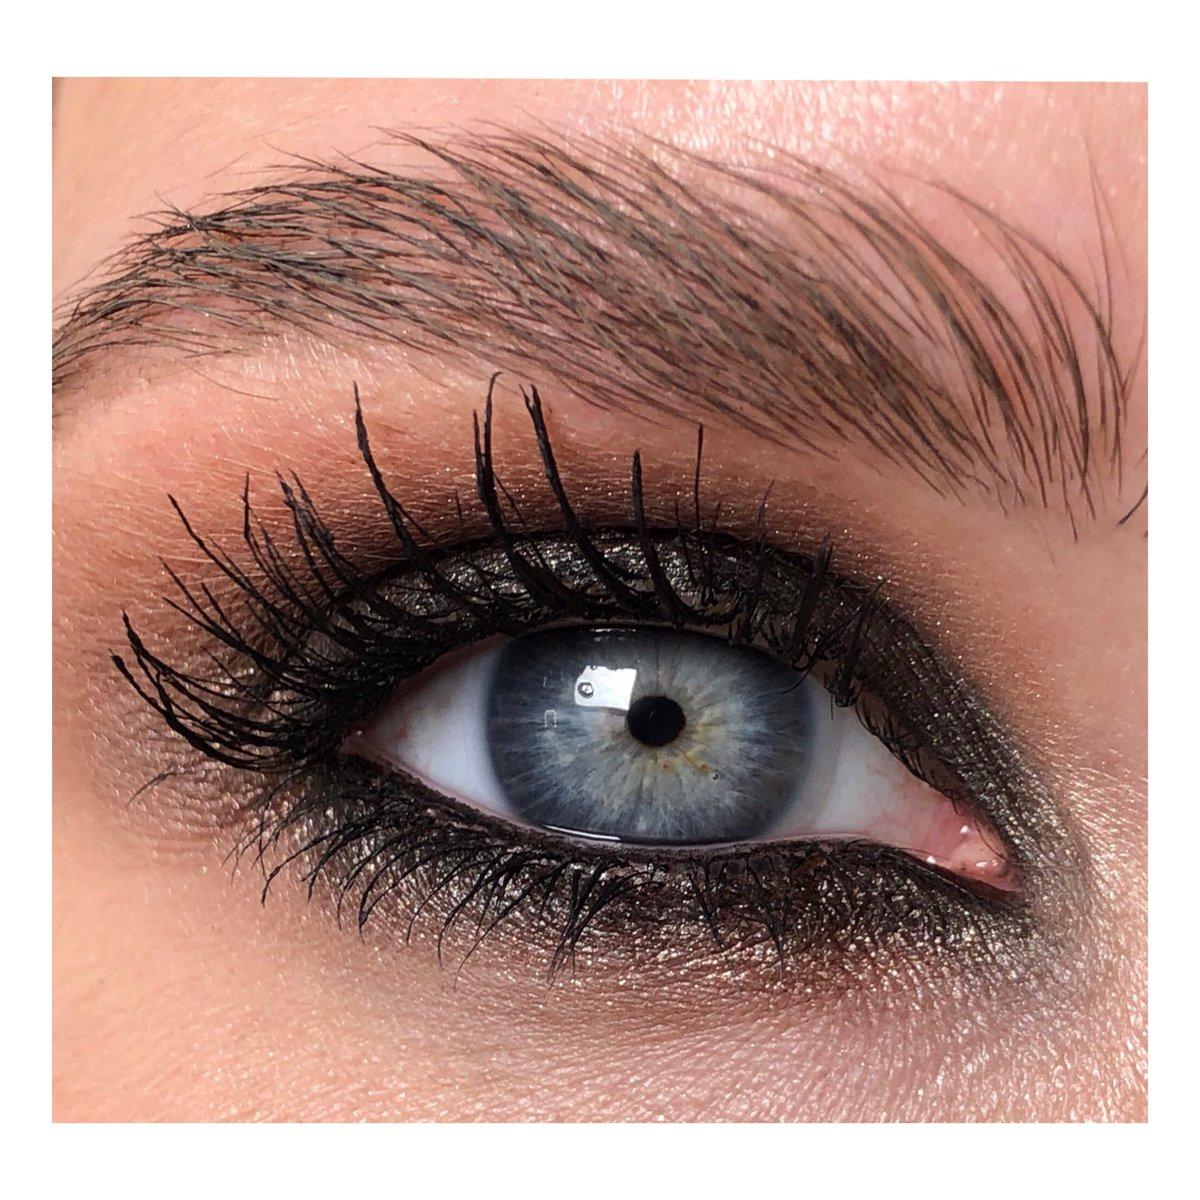 🌑 EYE 🌑 — — — #makeupartist #eyeshadow #макияжглазчелябинск #визажистекб #визажистчелябинск #идеимакияжа #челябинскмакияж #chelyabinskfoto #челябинсксегодня #makeupmoscow #inbeautmag #eyemakeup #makeup74 #makeupnyc #makeupla #makeupeurope  @inbeautmag @modelmalay